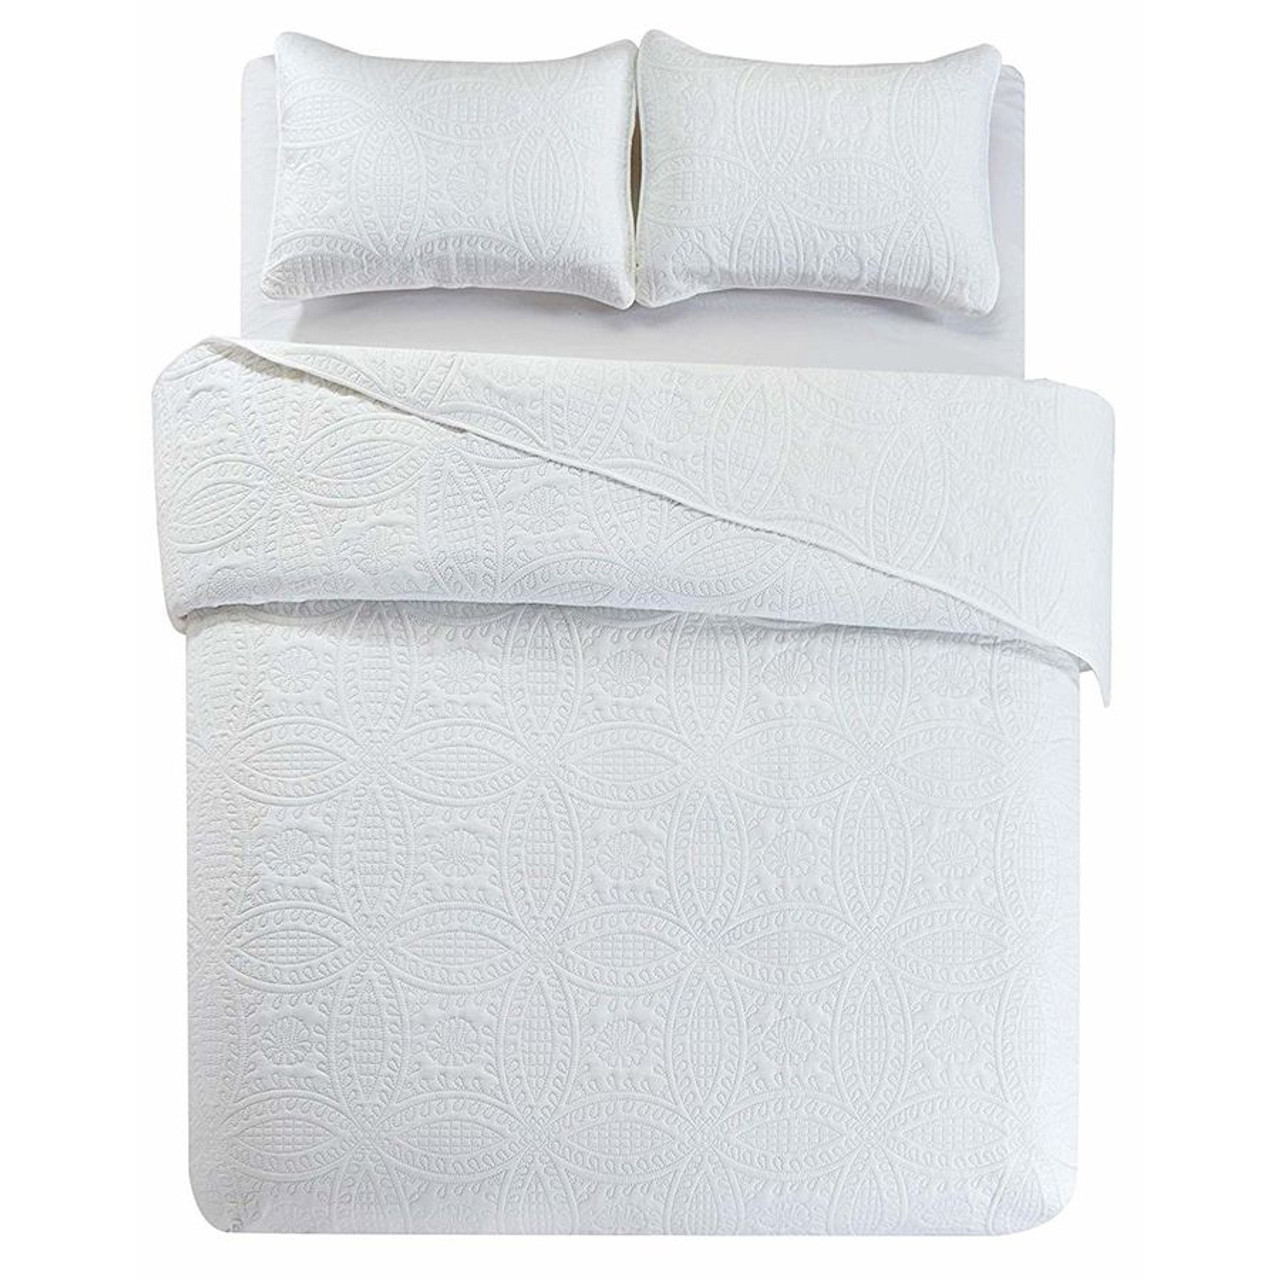 3 Pc Oversized Bedspread Coverlet Set White Color in USA, California, New York, New York City, Los Angeles, San Francisco, Pennsylvania, Washington DC, Virginia and Maryland